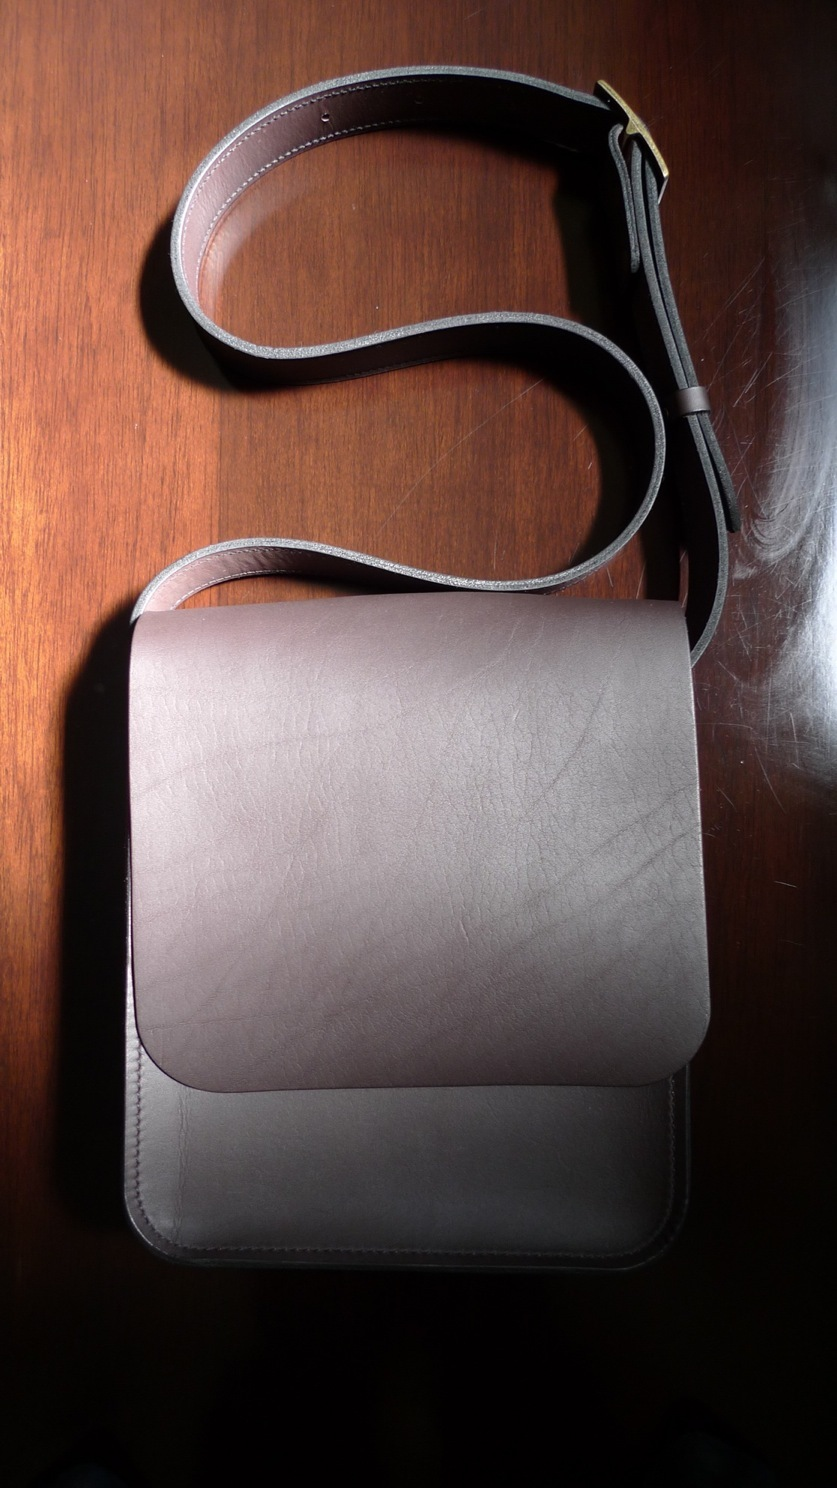 Satchel Bags World